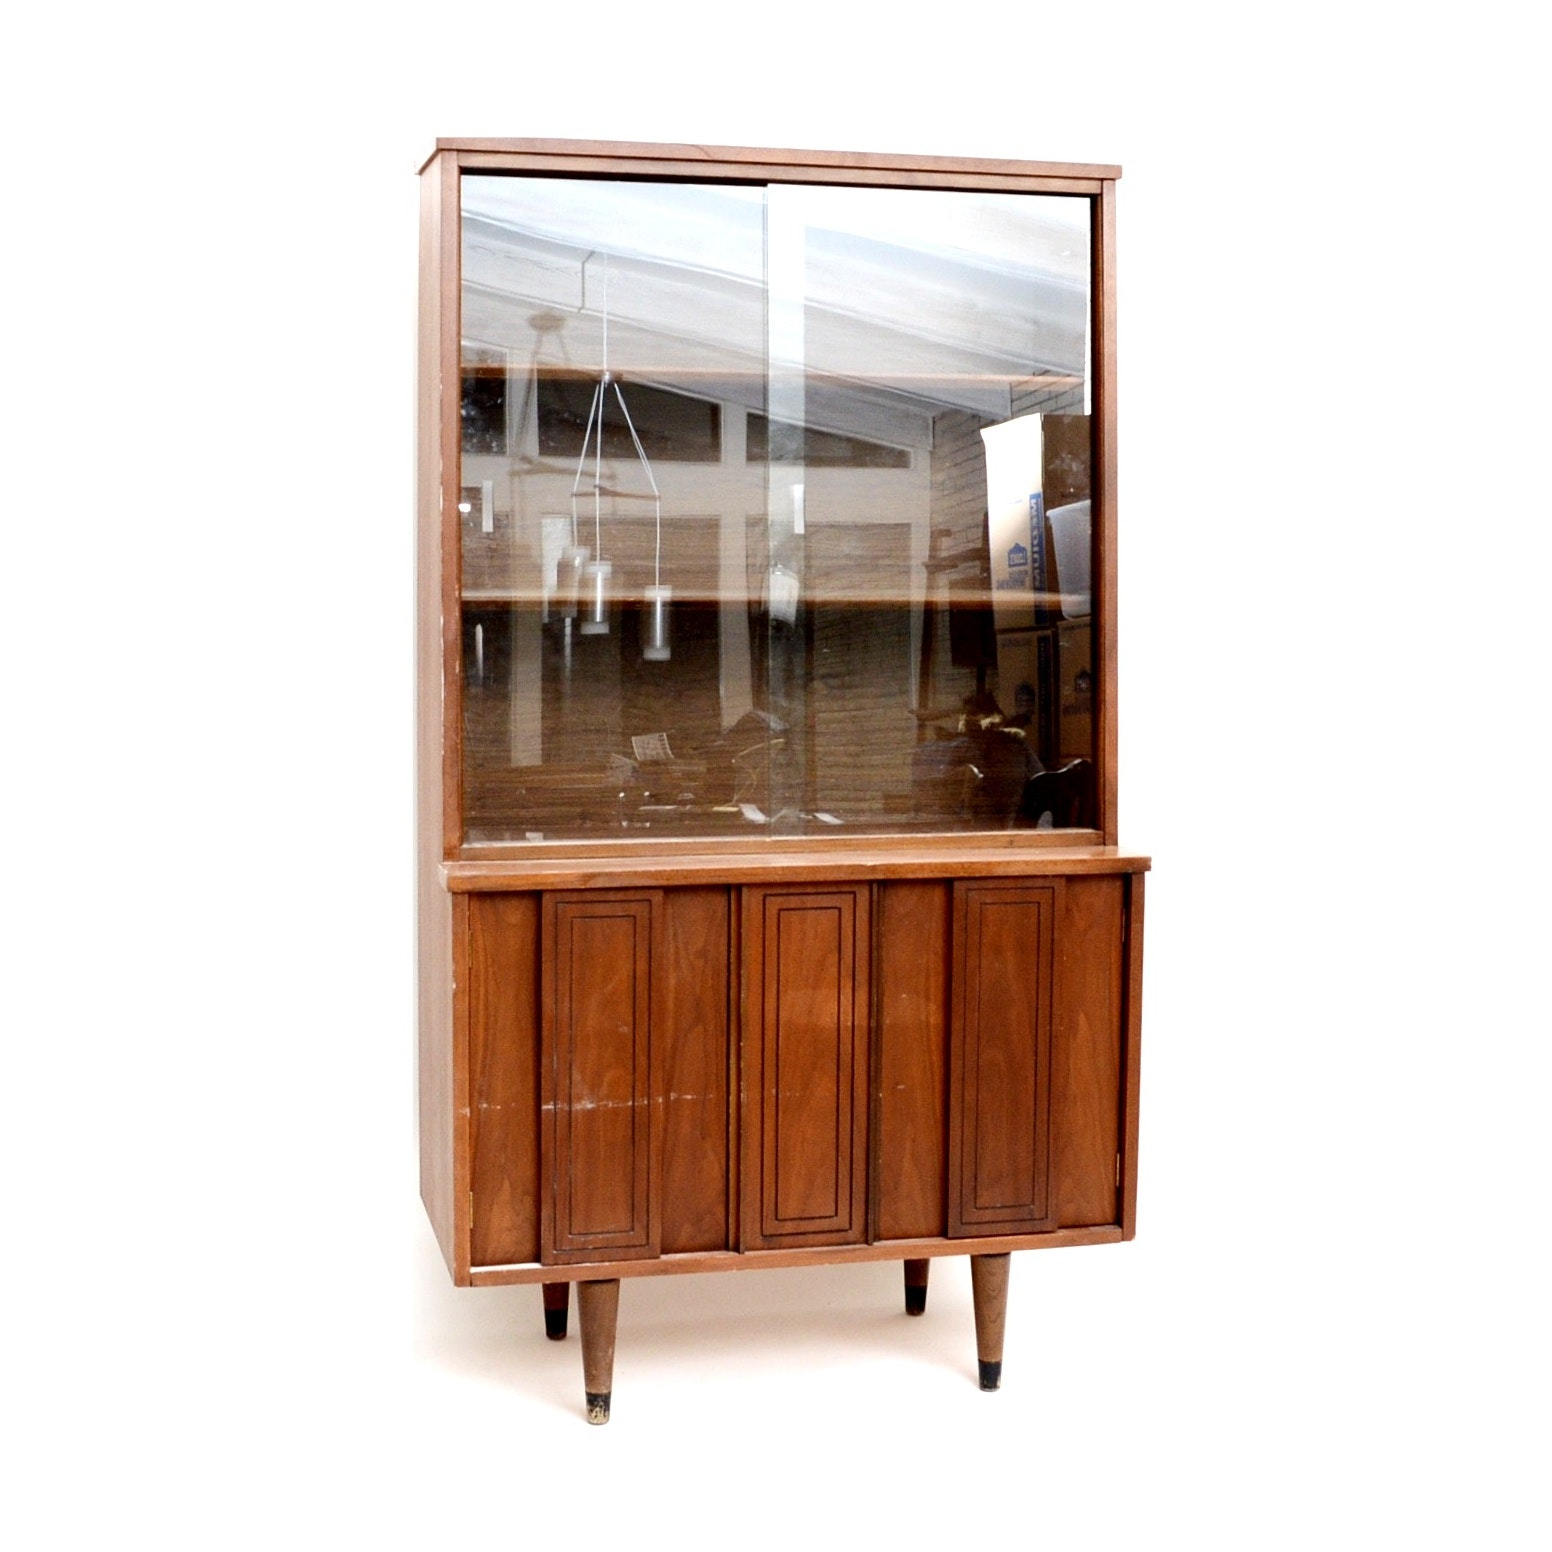 Vintage Mid Century Modern Sliding Glass Door China Hutch ...  sc 1 st  EBTH.com & Vintage Mid Century Modern Sliding Glass Door China Hutch : EBTH